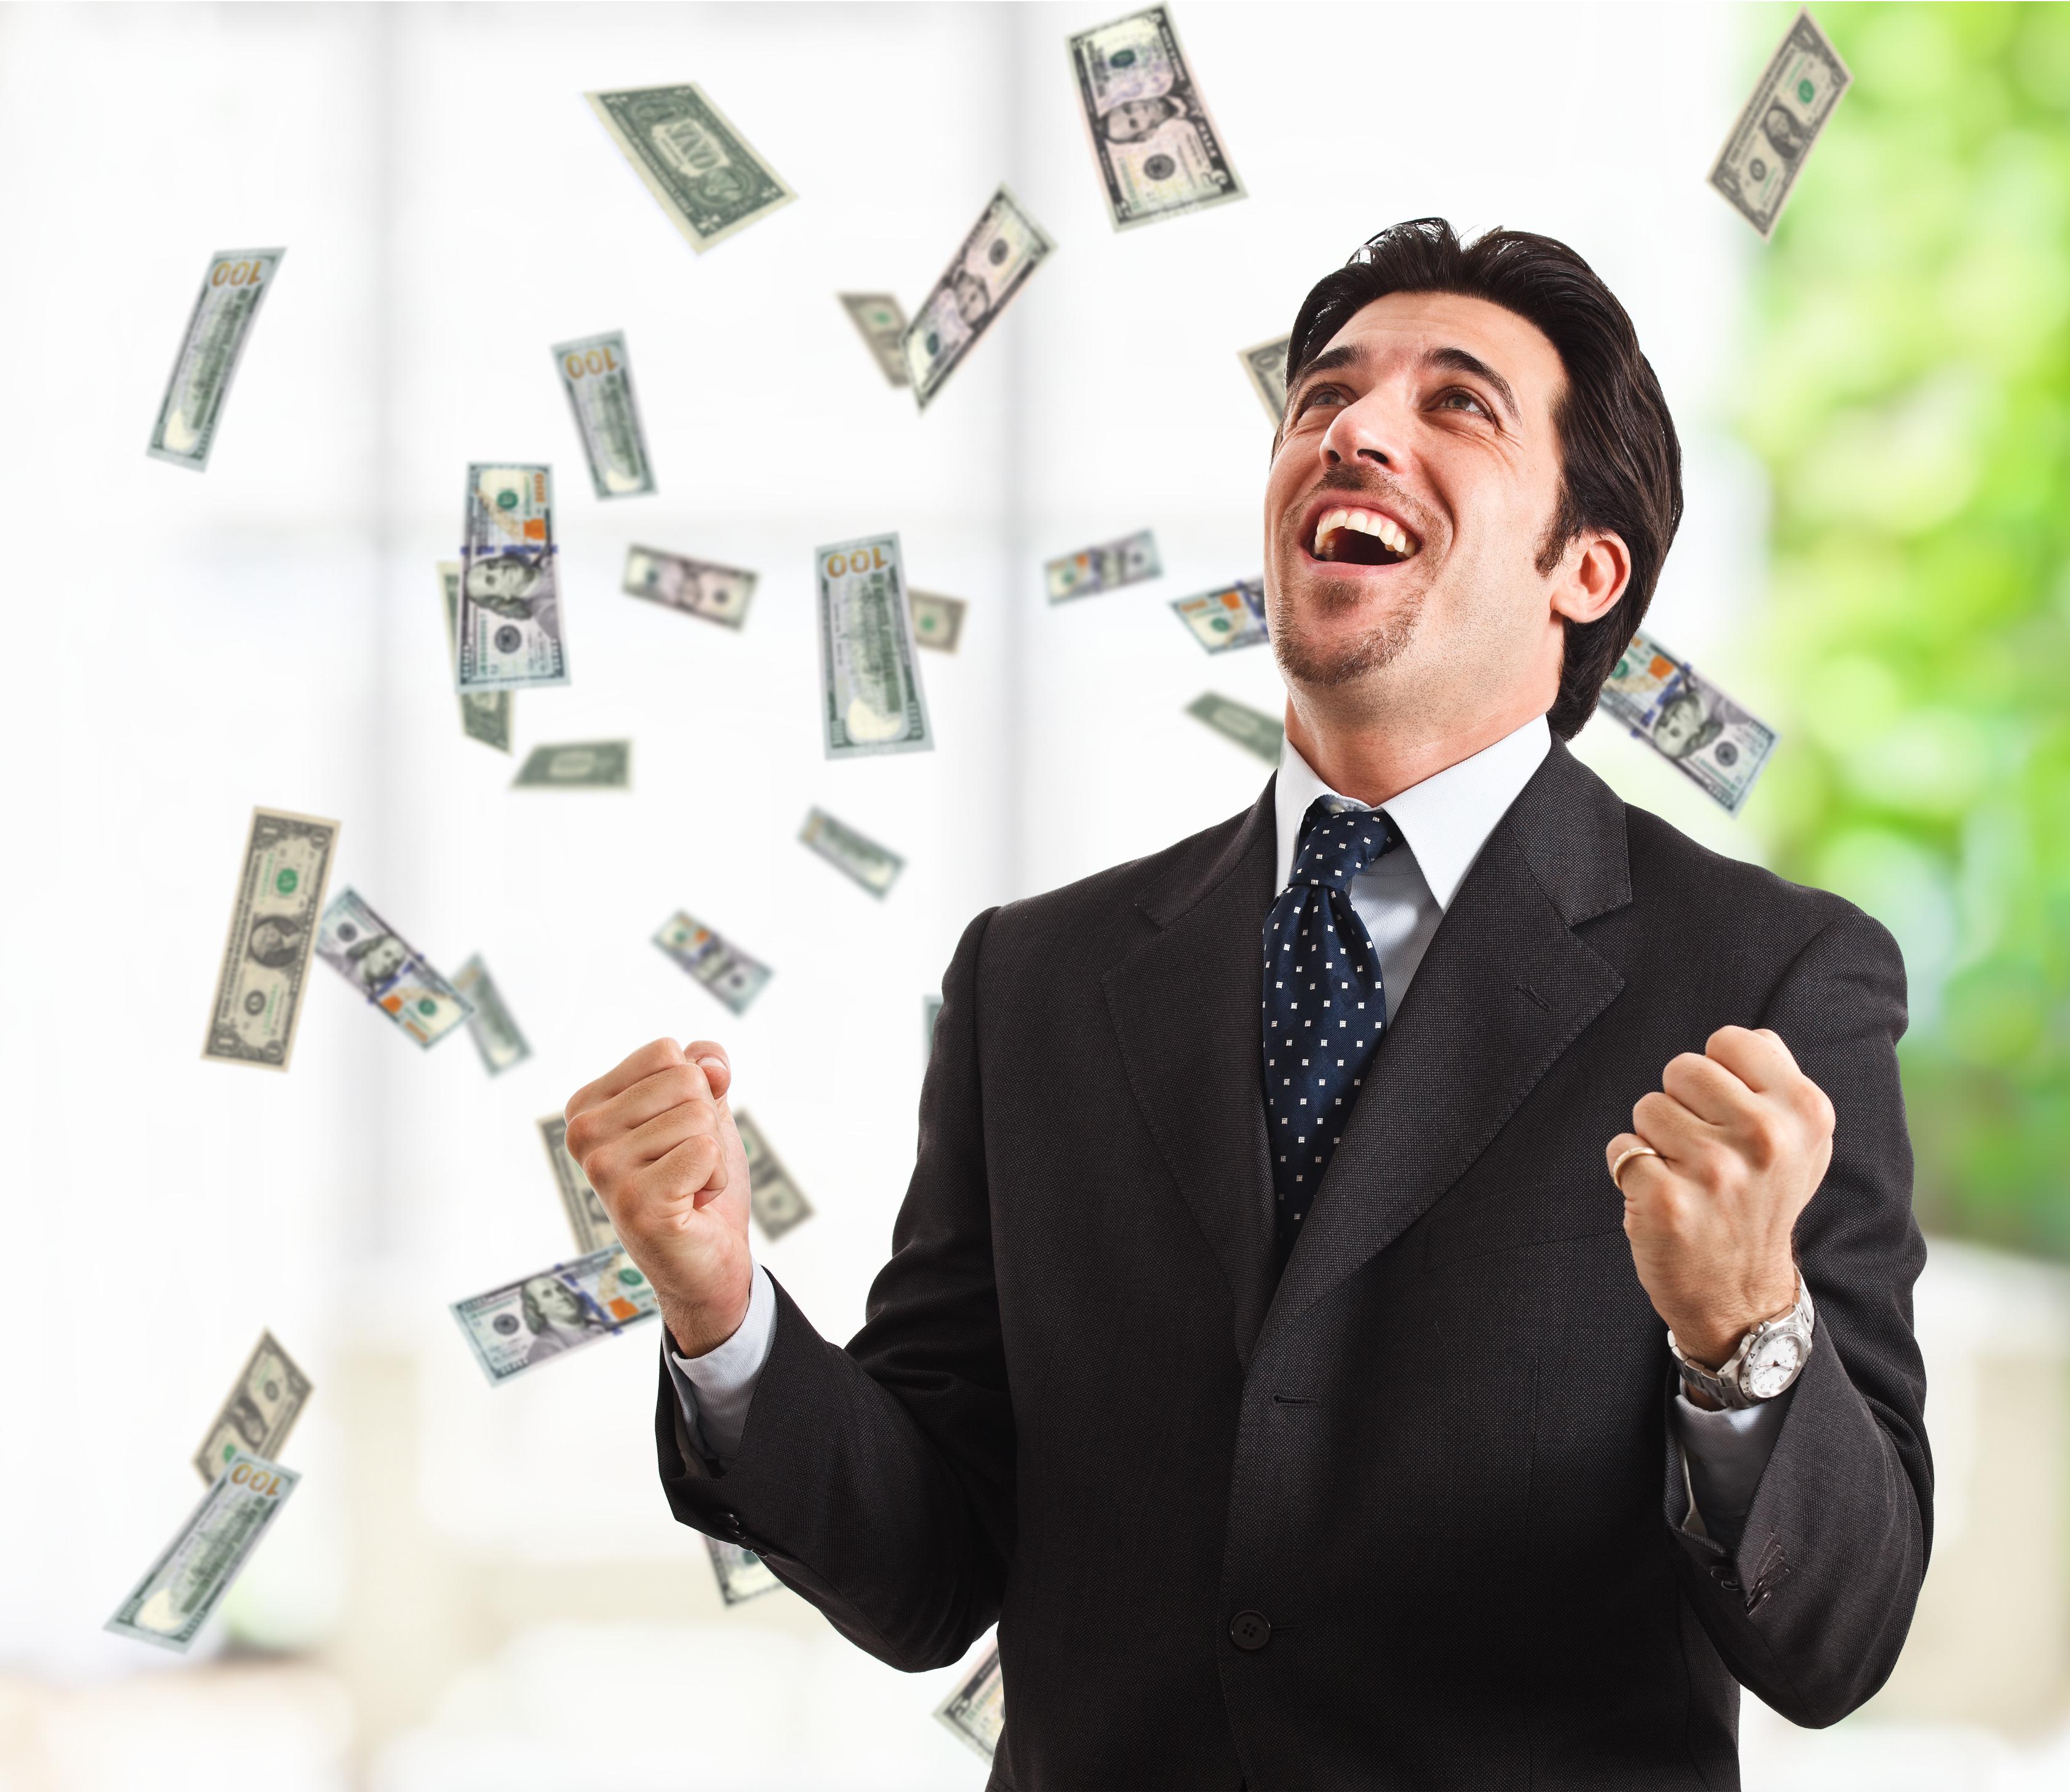 Картинки повышение зарплаты для карты желаний, ужасы